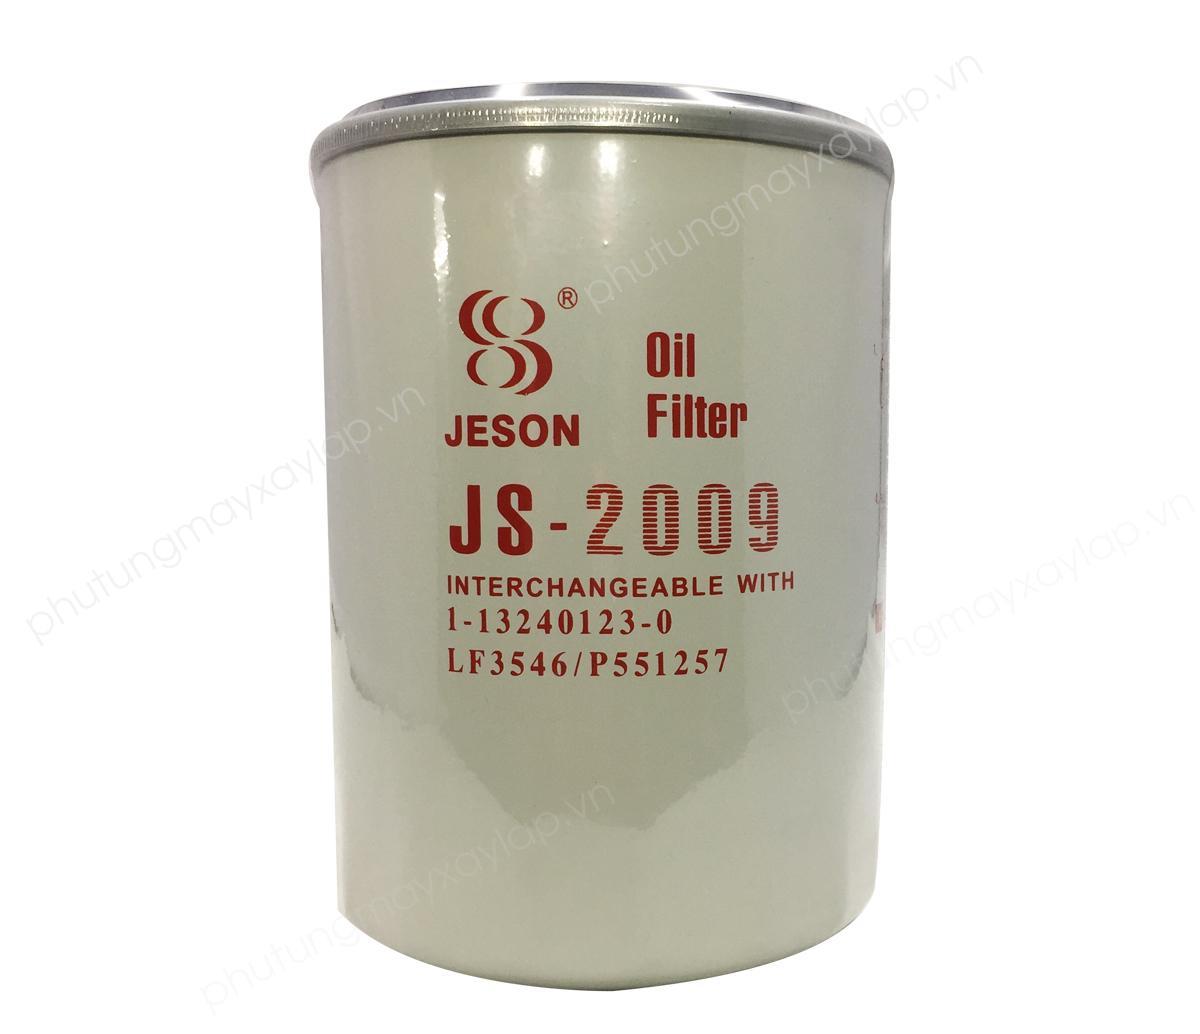 Lọc dầu JS2009-C1506